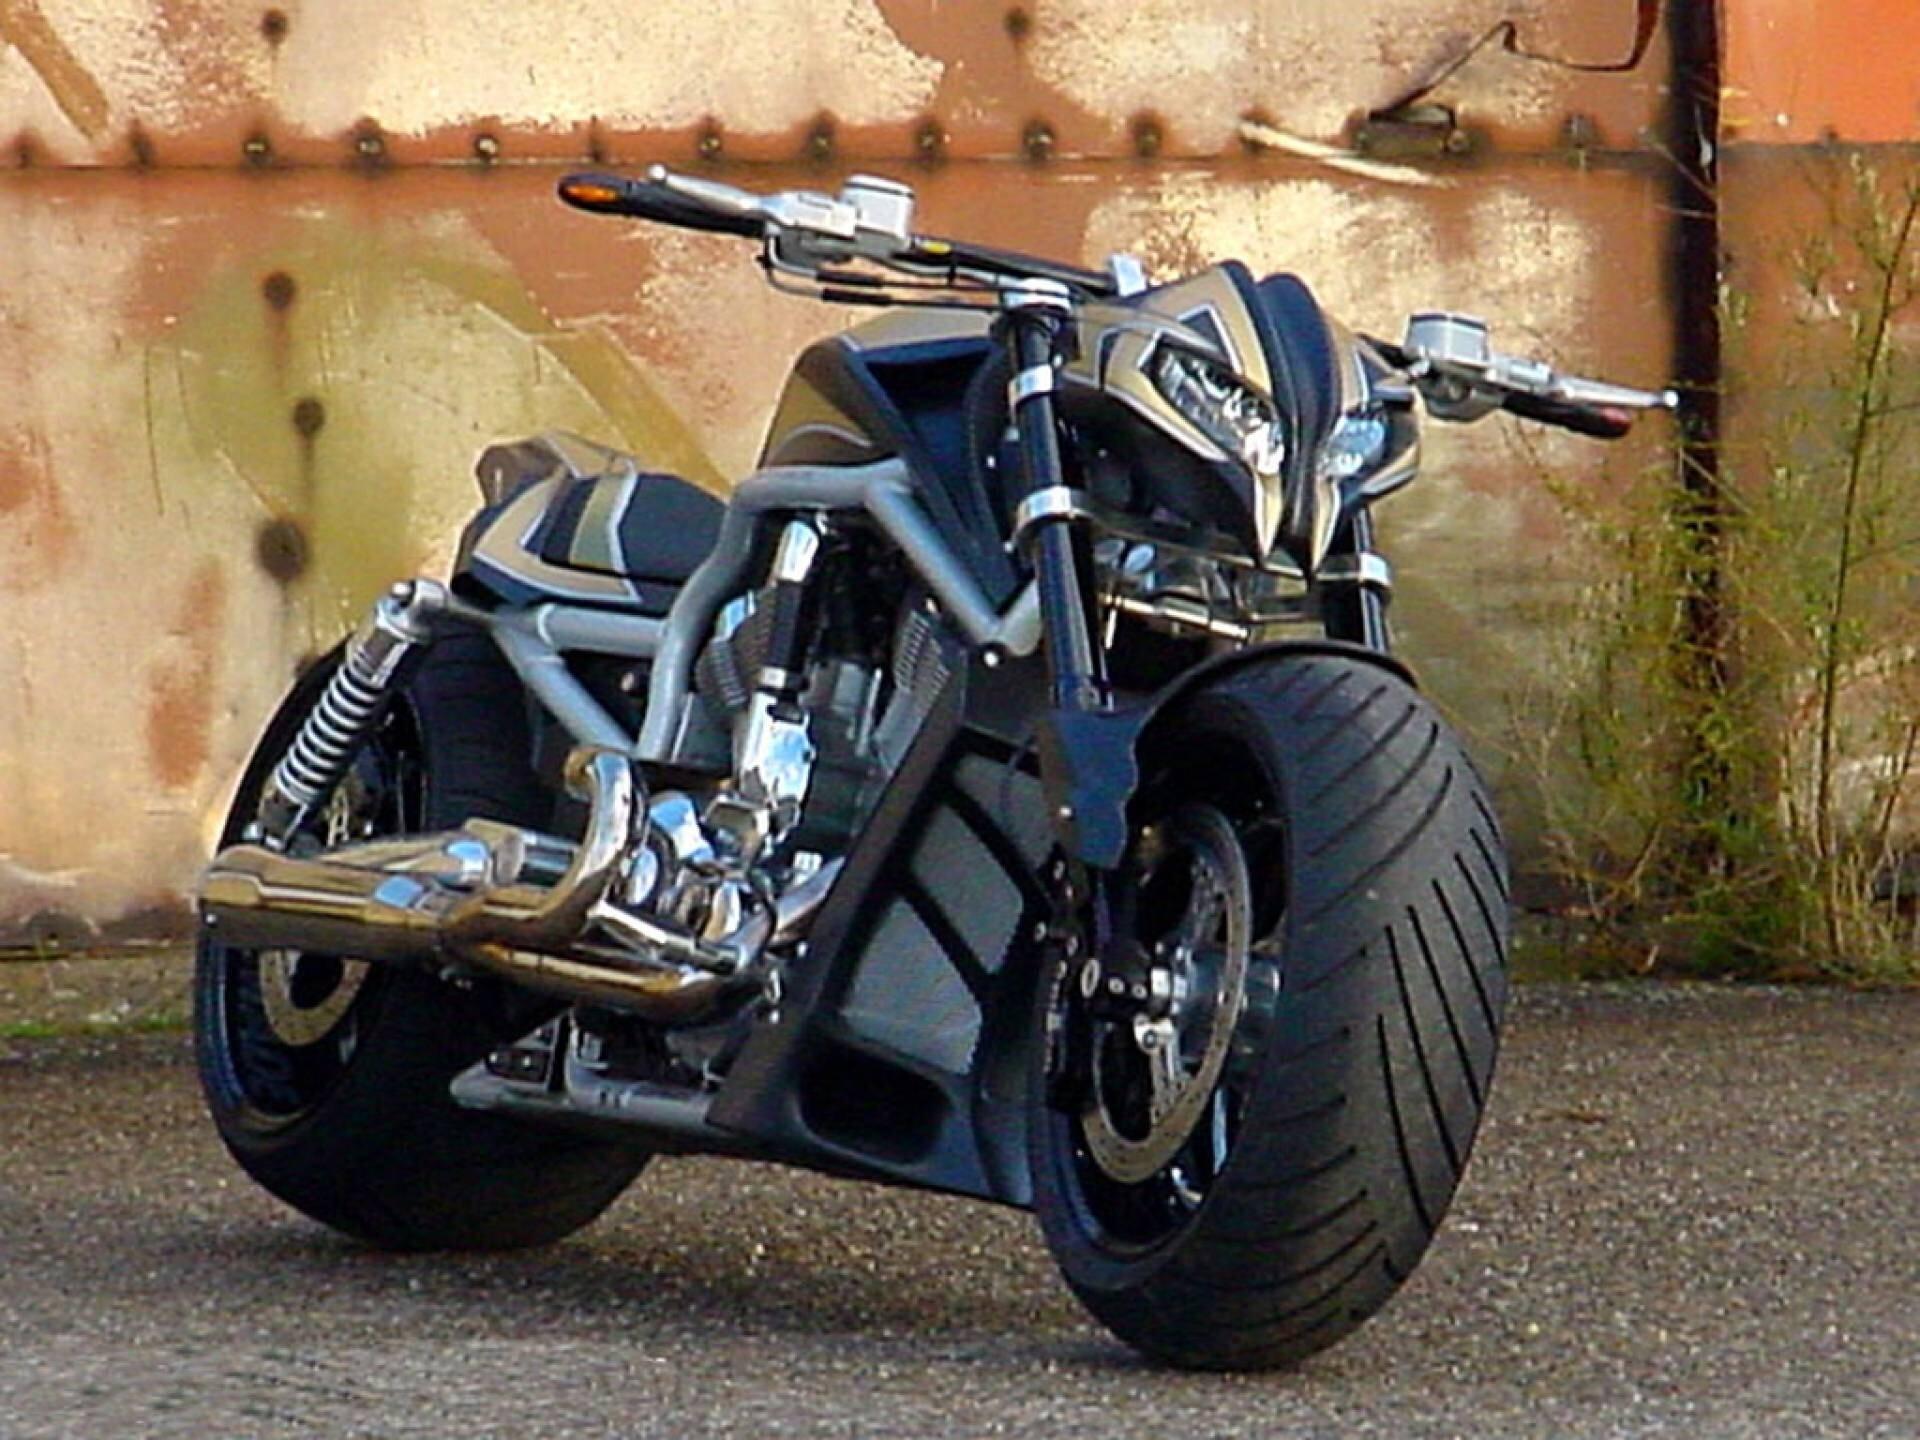 big tyre sport bike hd wallpapers. Black Bedroom Furniture Sets. Home Design Ideas